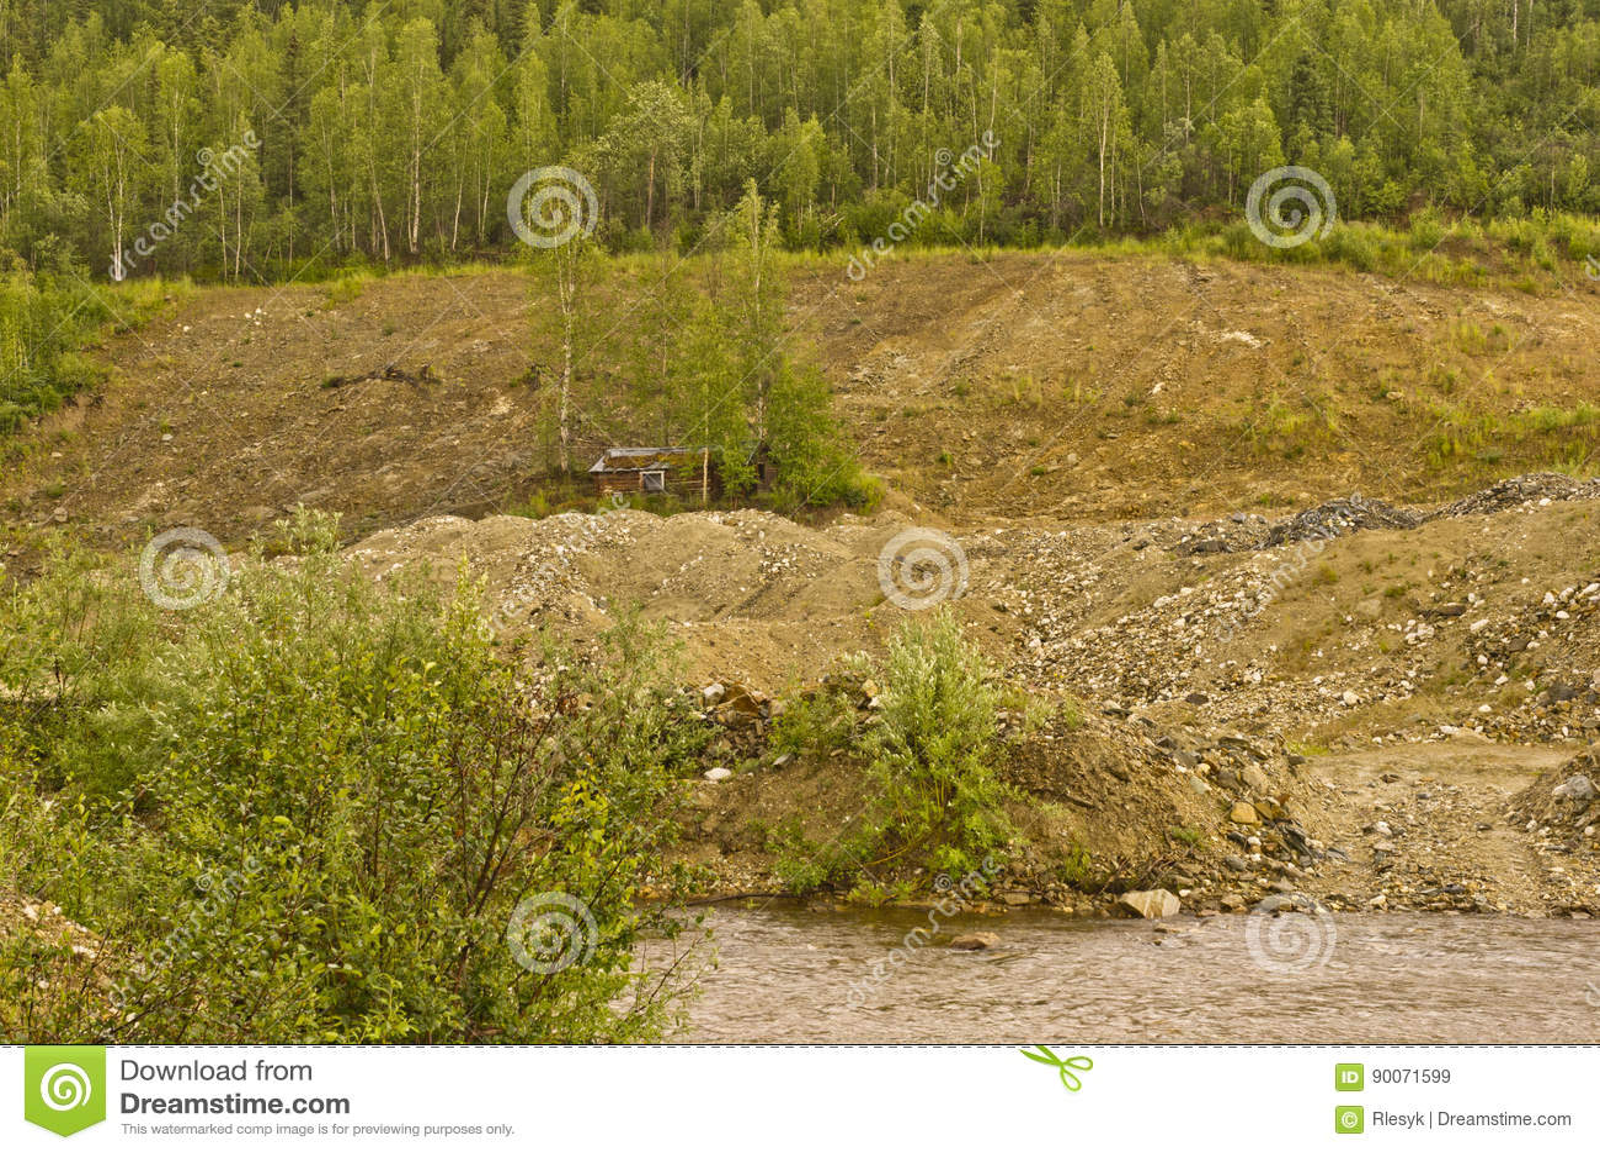 Tailings Piles On Bonanza Creek Stock Image - Image of creek